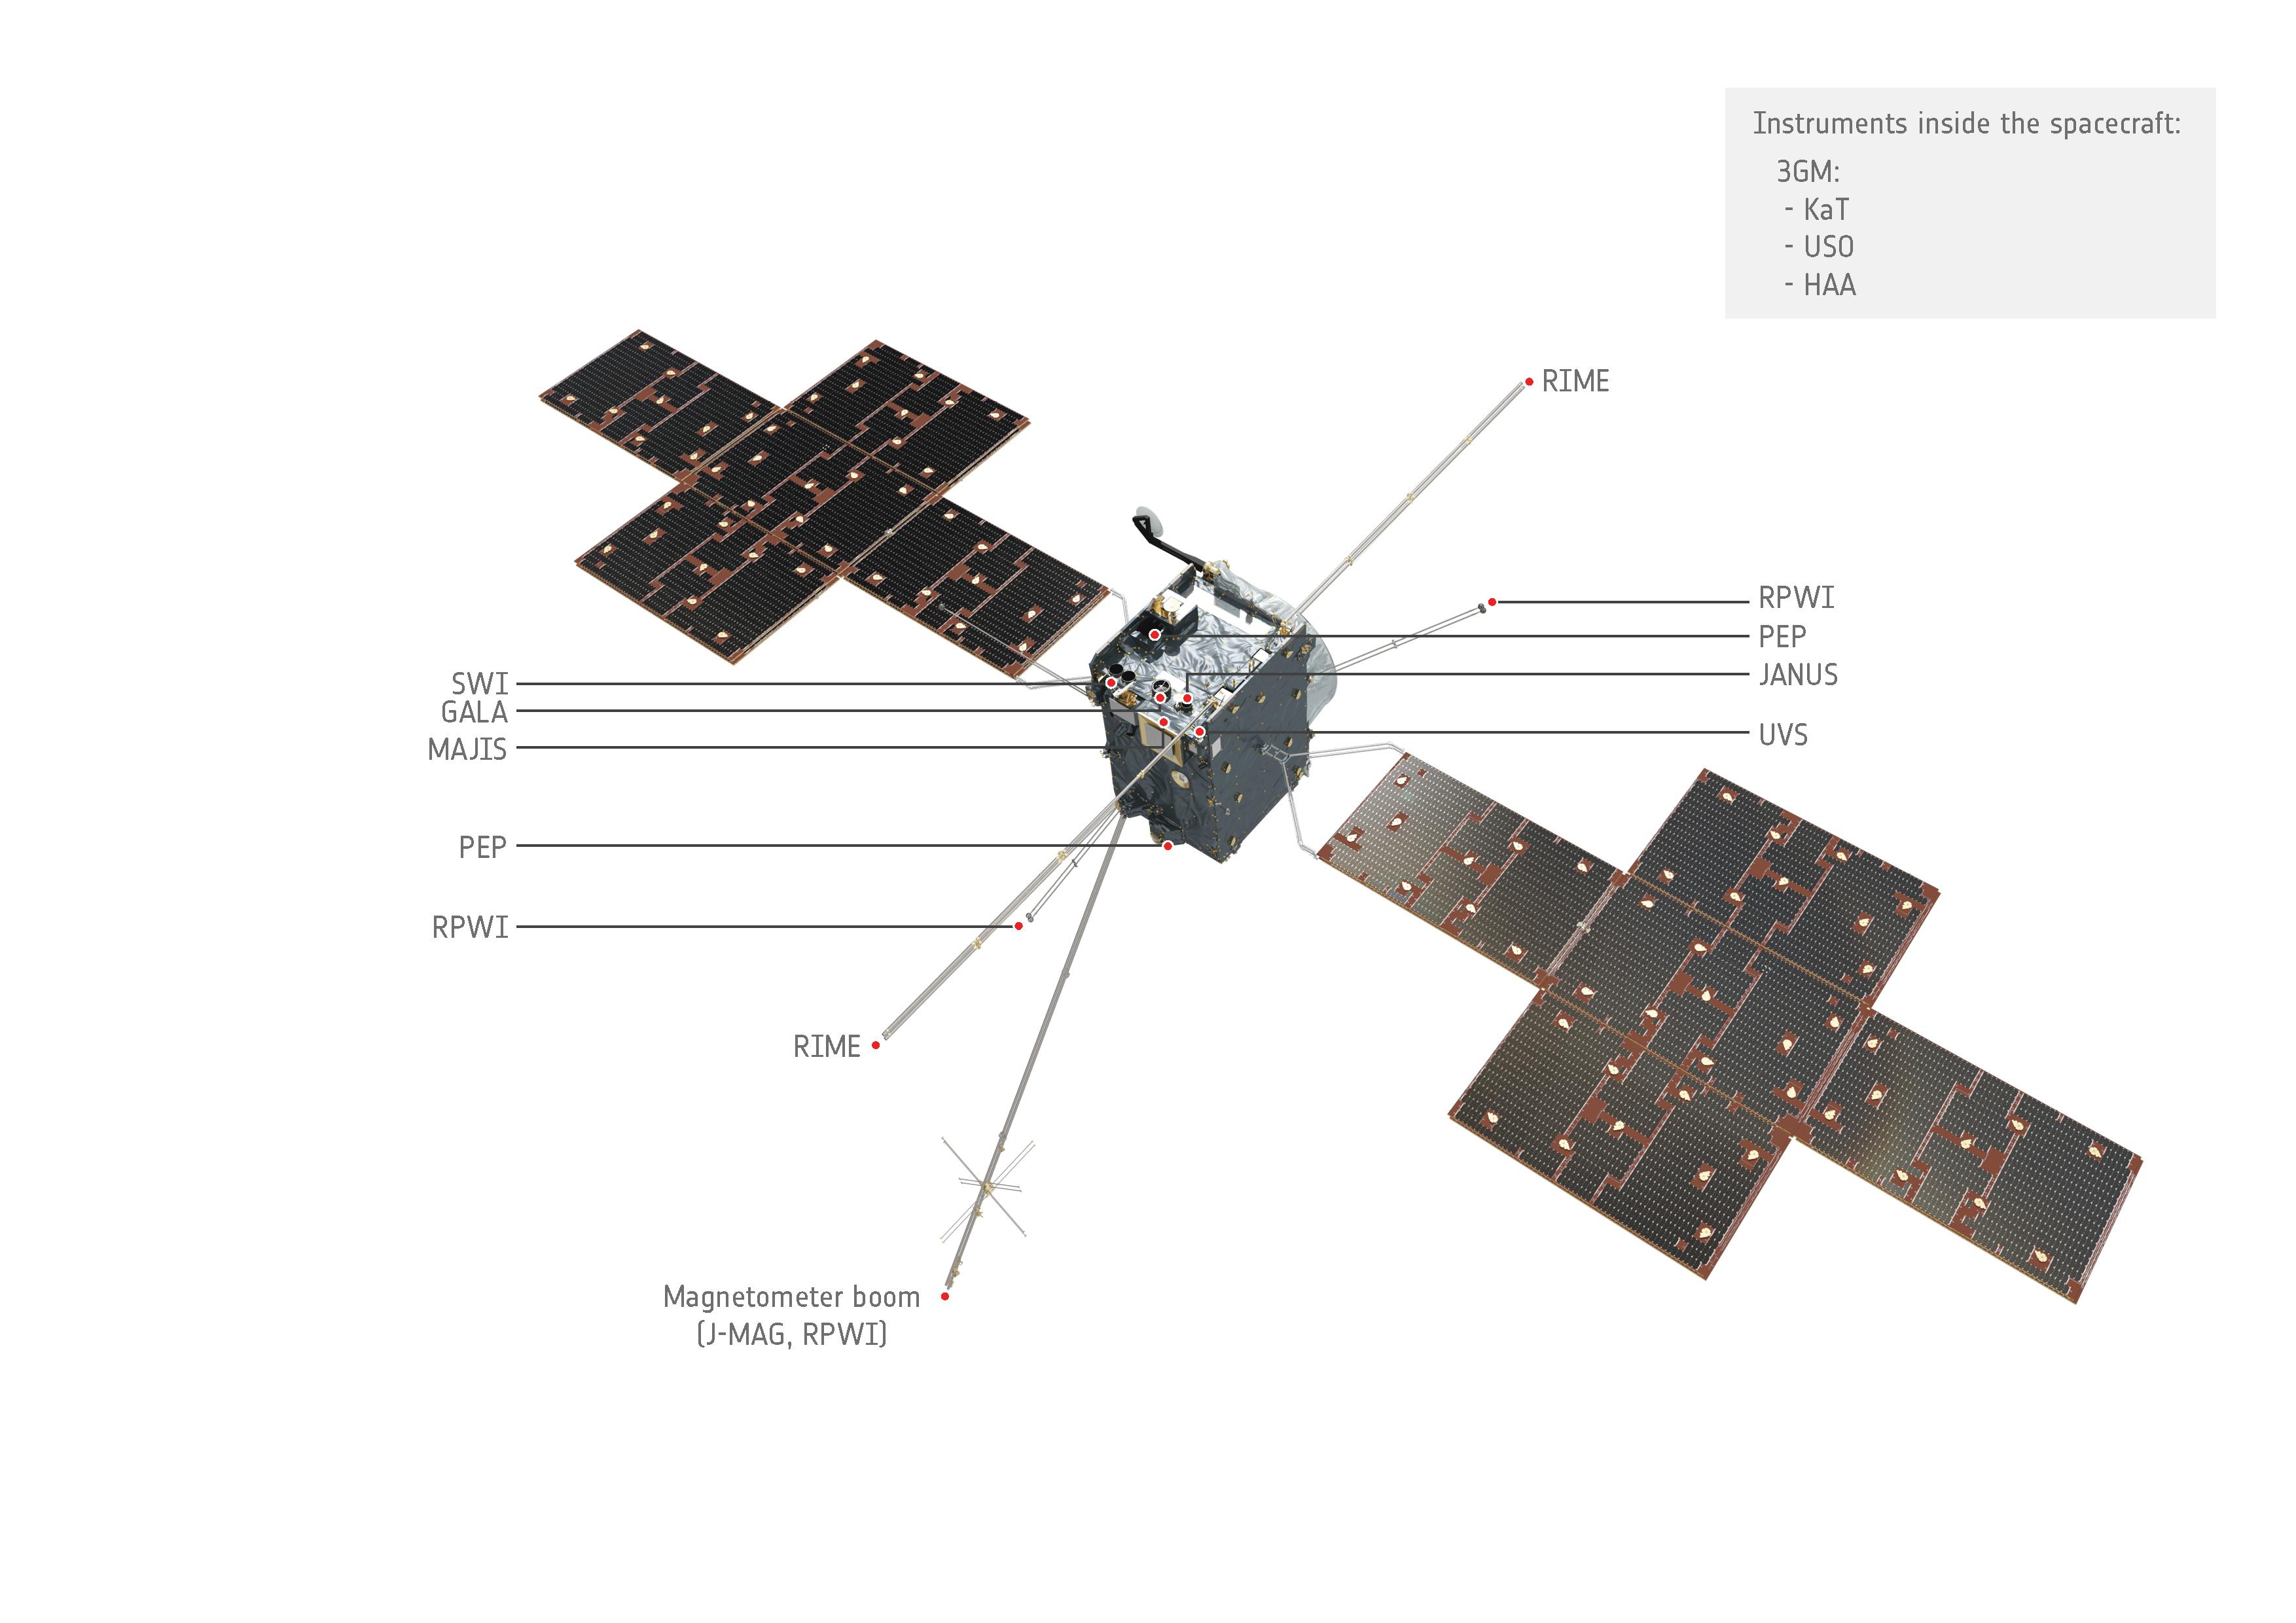 1567214202664-ESA_JUICE_Instruments.jpg